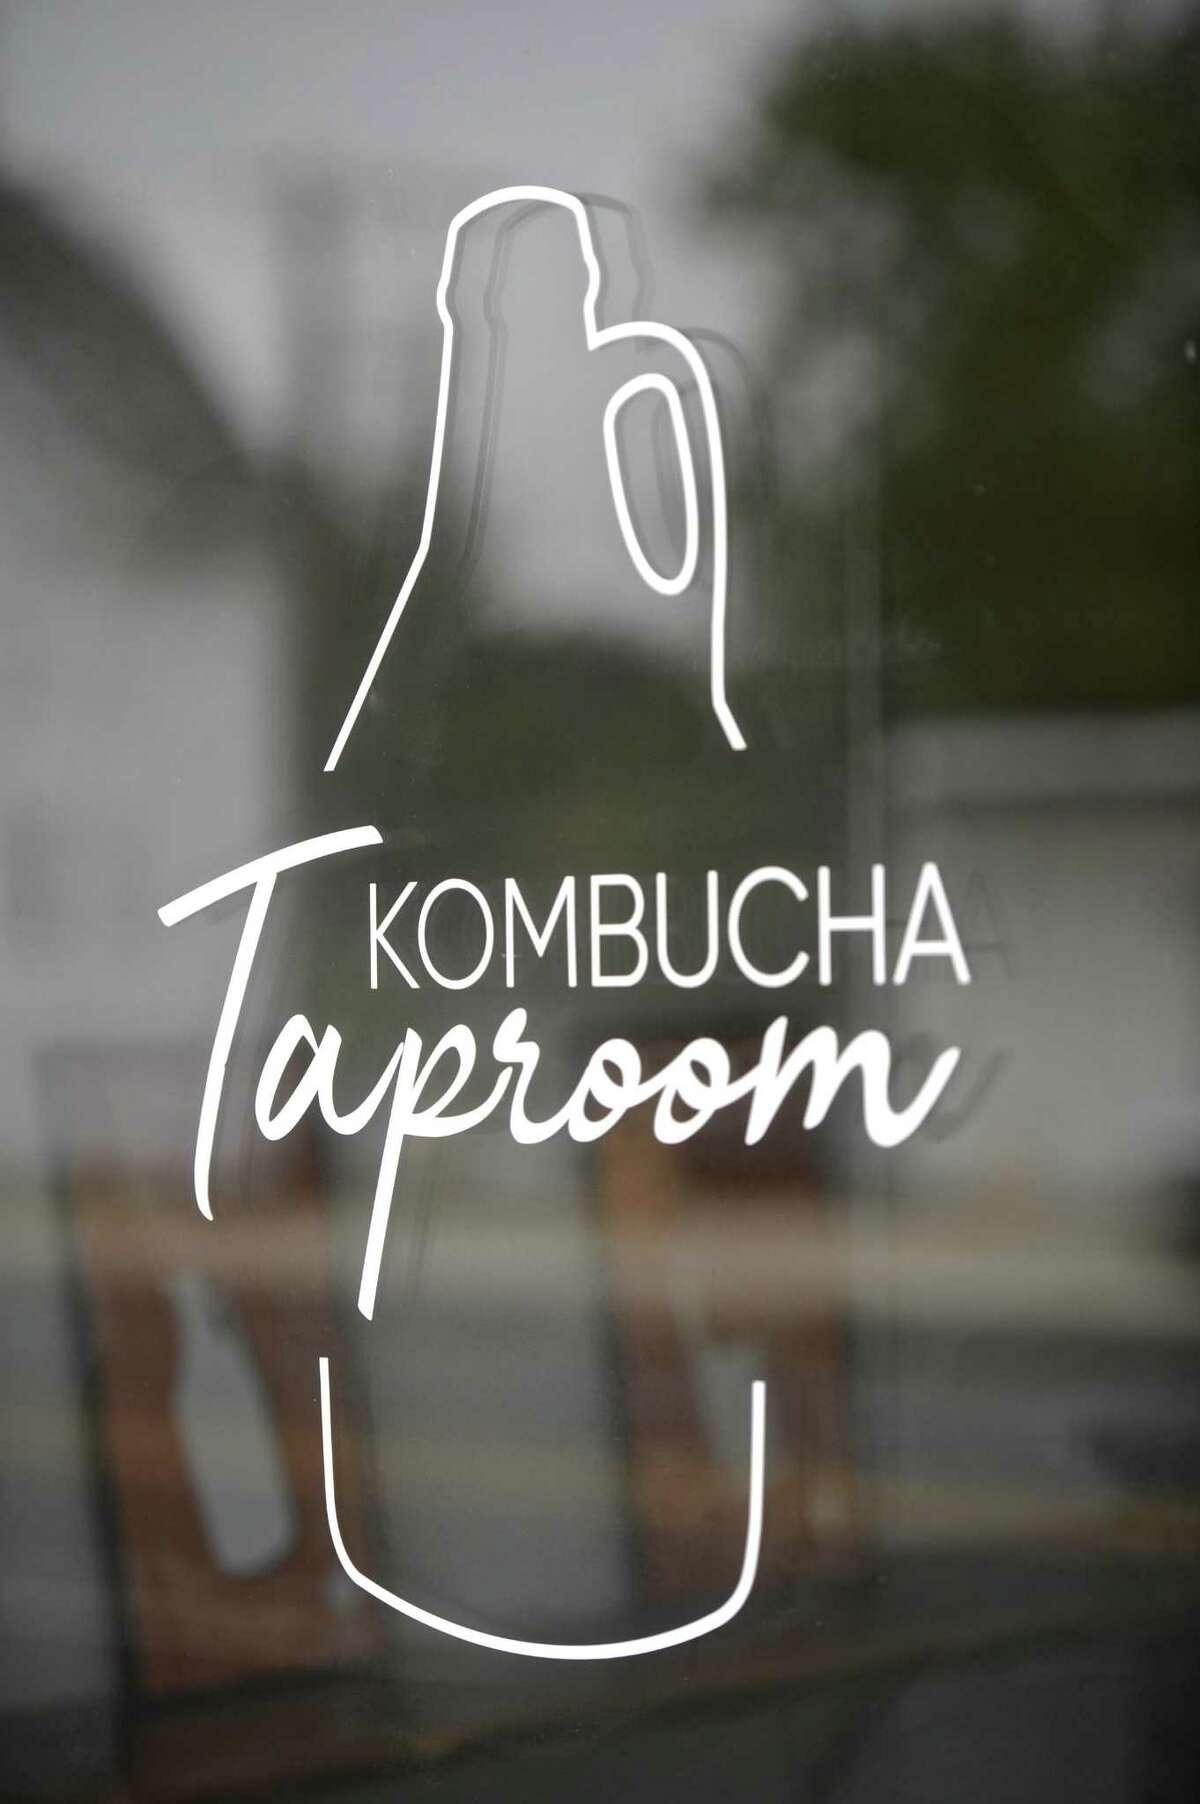 Window for the new Cross Culture Kombucha taproom in Danbury. Wednesday, September 12, 2018, in Danbury, Conn.